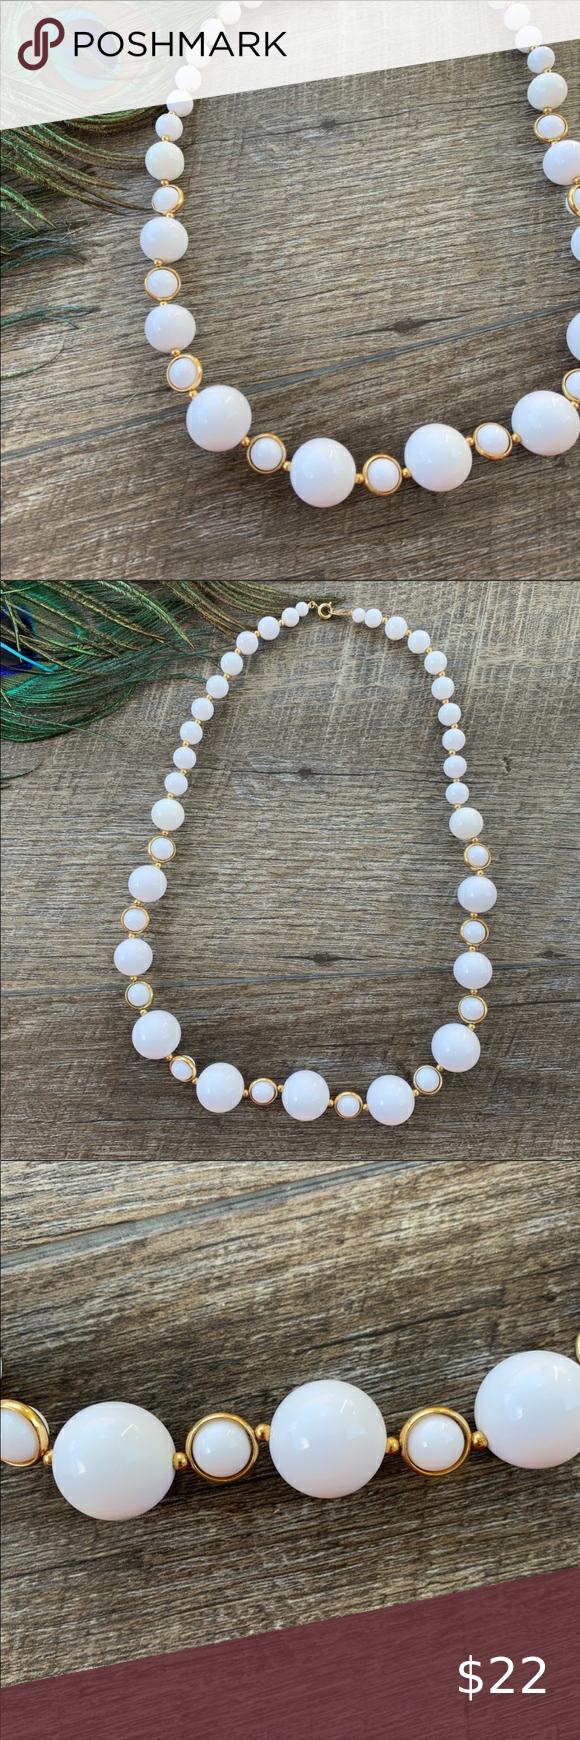 Vintage White & Gold Different Size Balls Necklace